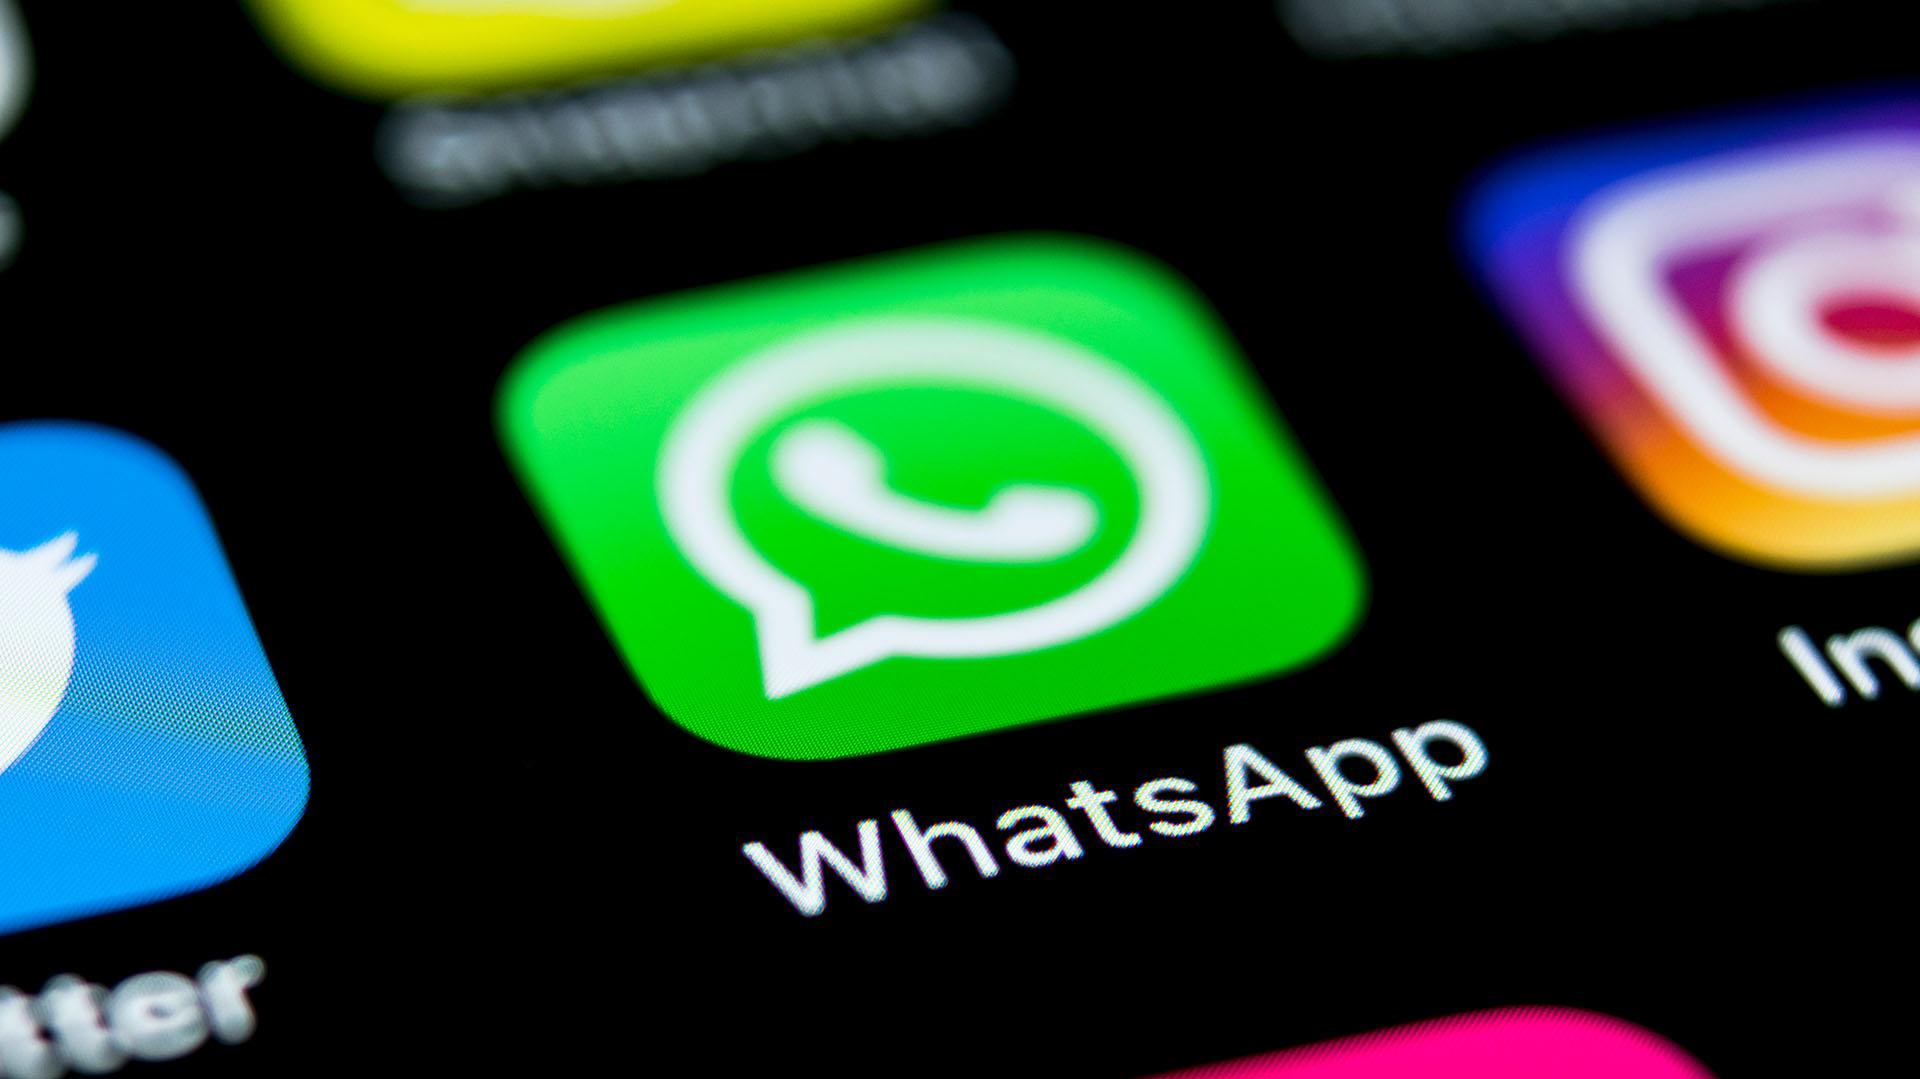 Verificador de números telefónicos: Whatsapp Filter